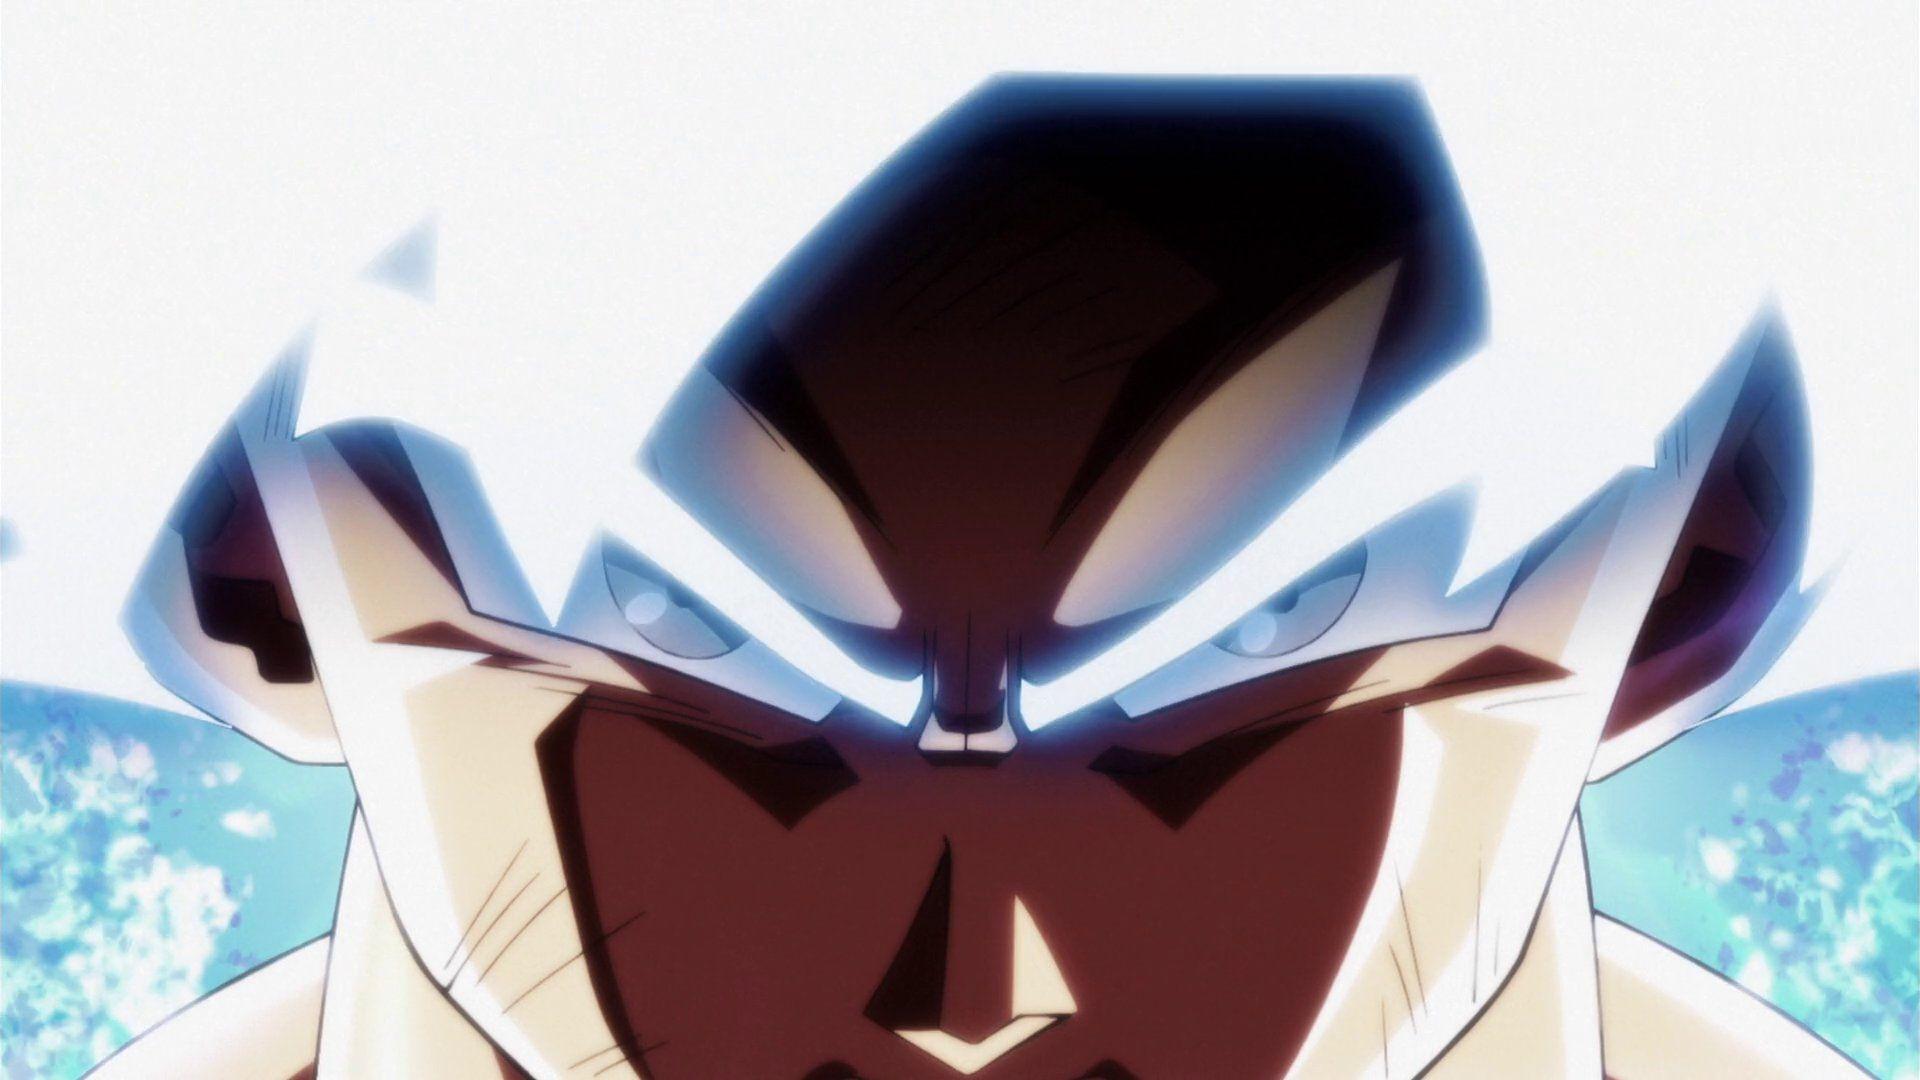 Dragon Ball Perfect Shots On Twitter Anime Dragon Ball Super Dragon Ball Super Dragon Ball